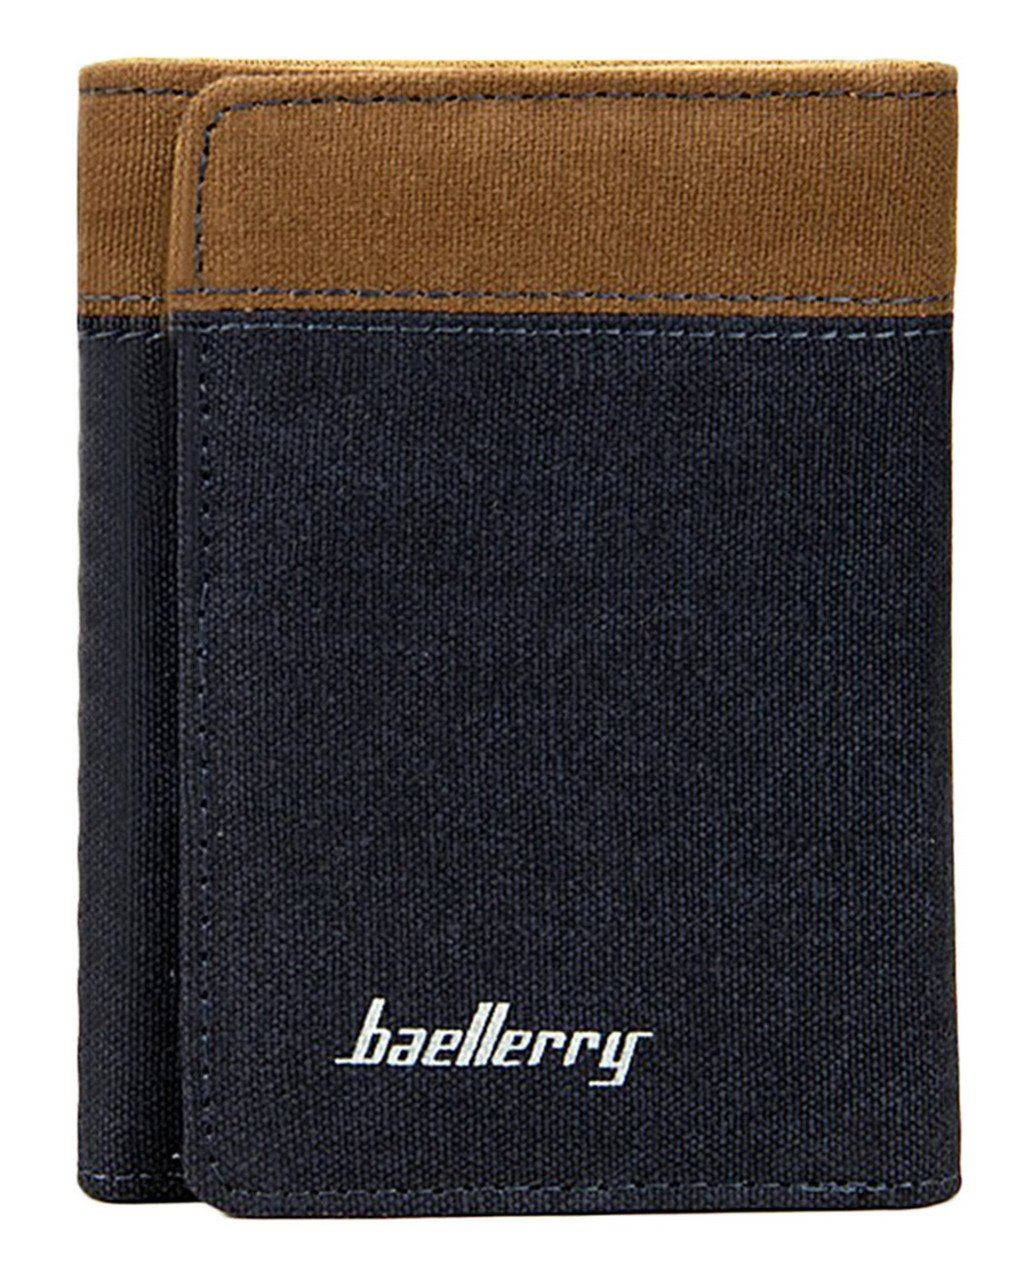 Lukis Canvas Mens Trifold Wallets Business Credit Card Holder Coin Pocket Men Wallet Purse Blue